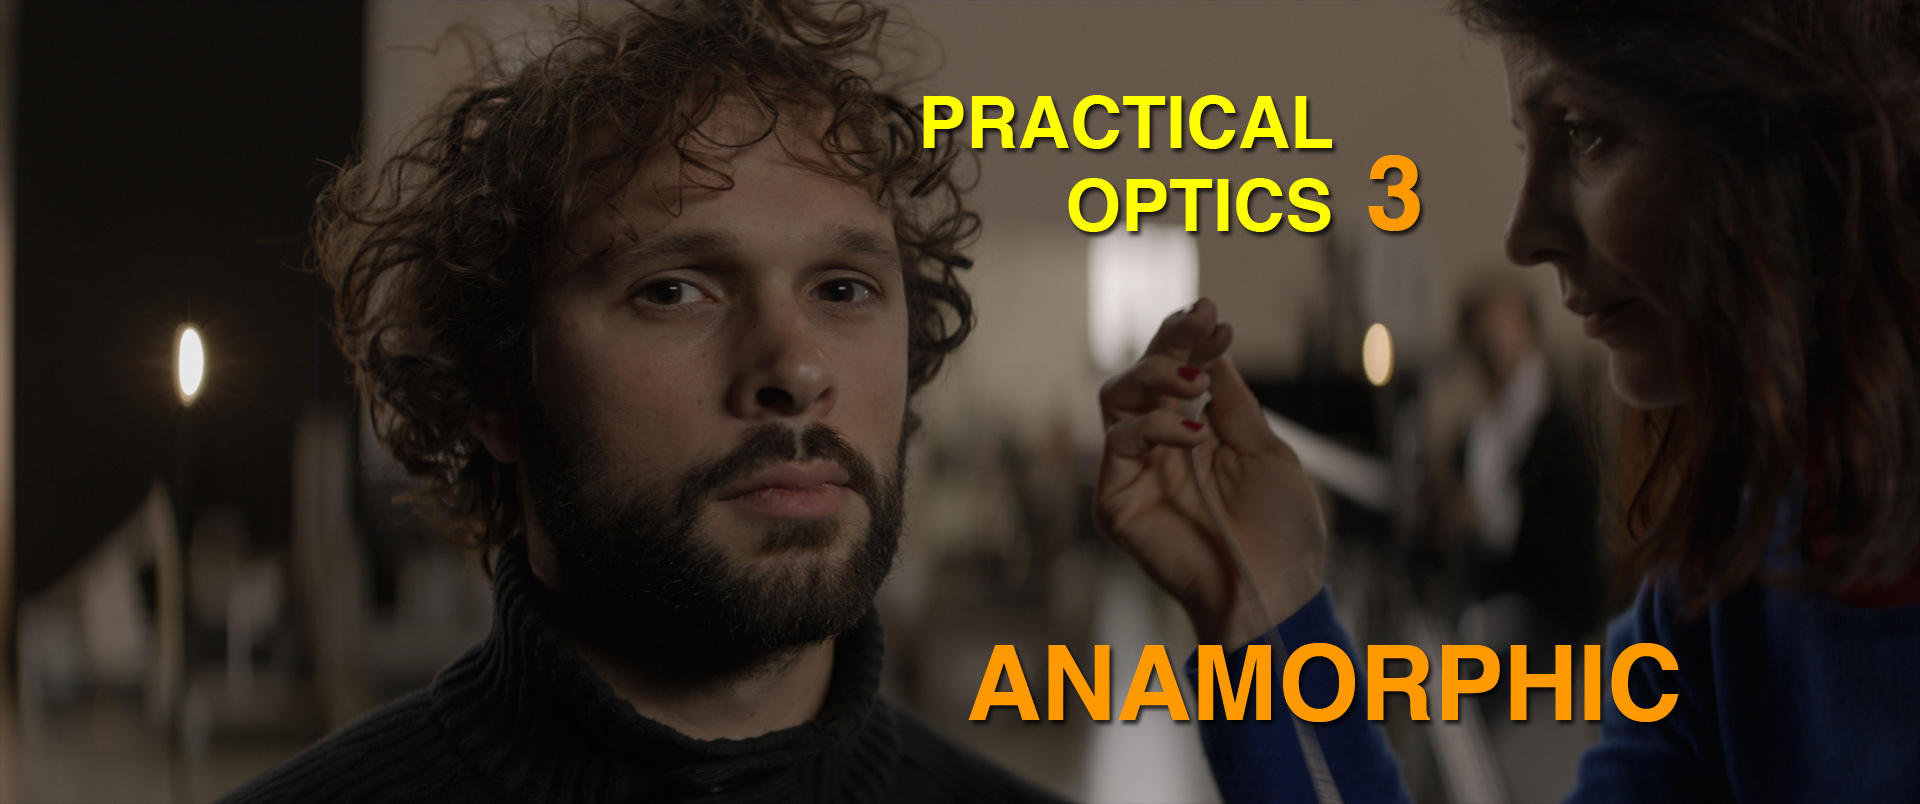 Practical Optics 3 Anamorphic Thefilmbook Hd